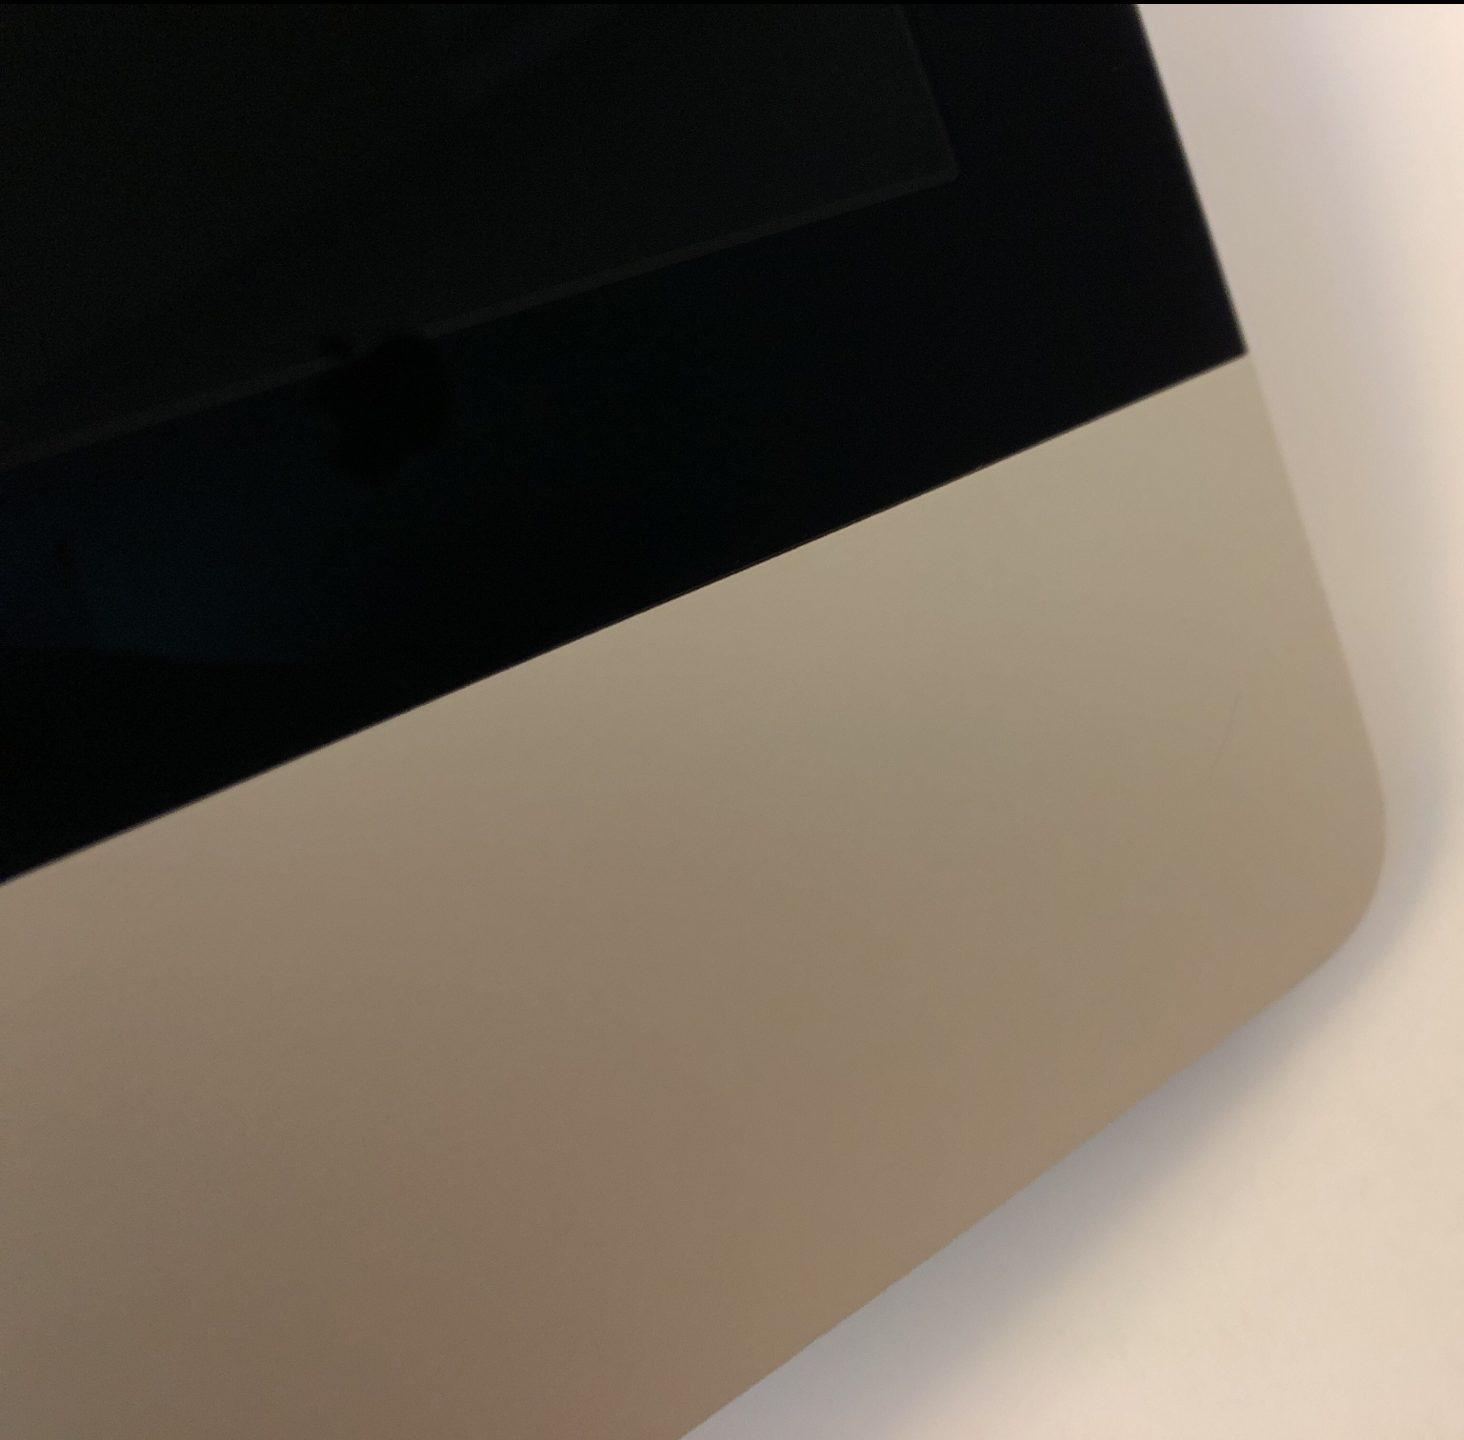 "iMac 27"" Late 2013 (Intel Quad-Core i7 3.5 GHz 32 GB RAM 1 TB HDD), Intel Quad-Core i7 3.5 GHz, 32 GB RAM, 1 TB HDD, immagine 4"